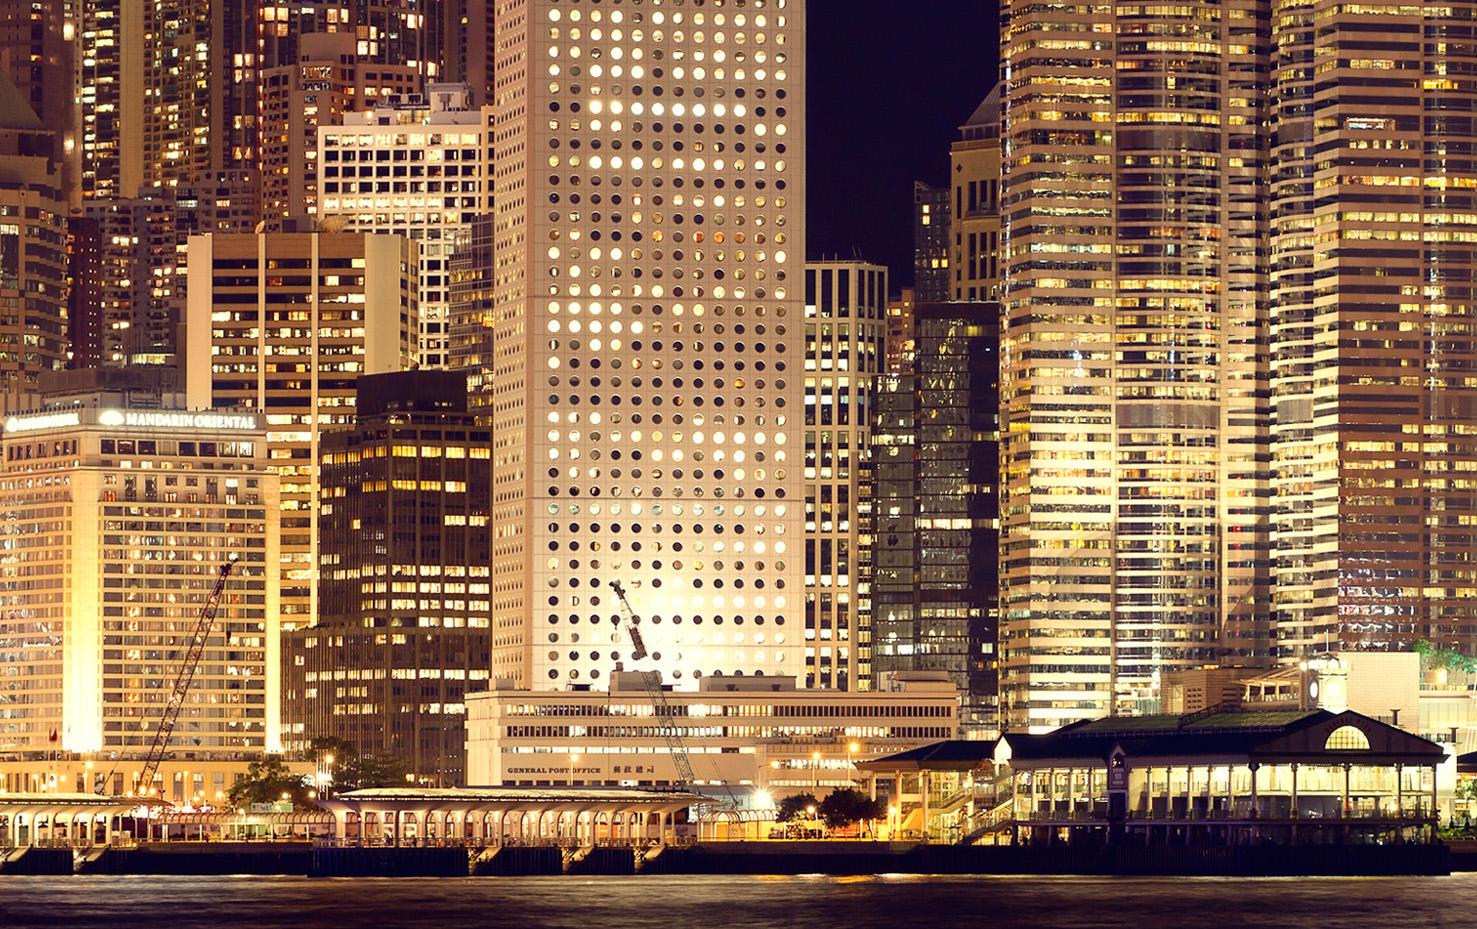 Hongkong-Skylines-Panoramic-color- edit crop 2